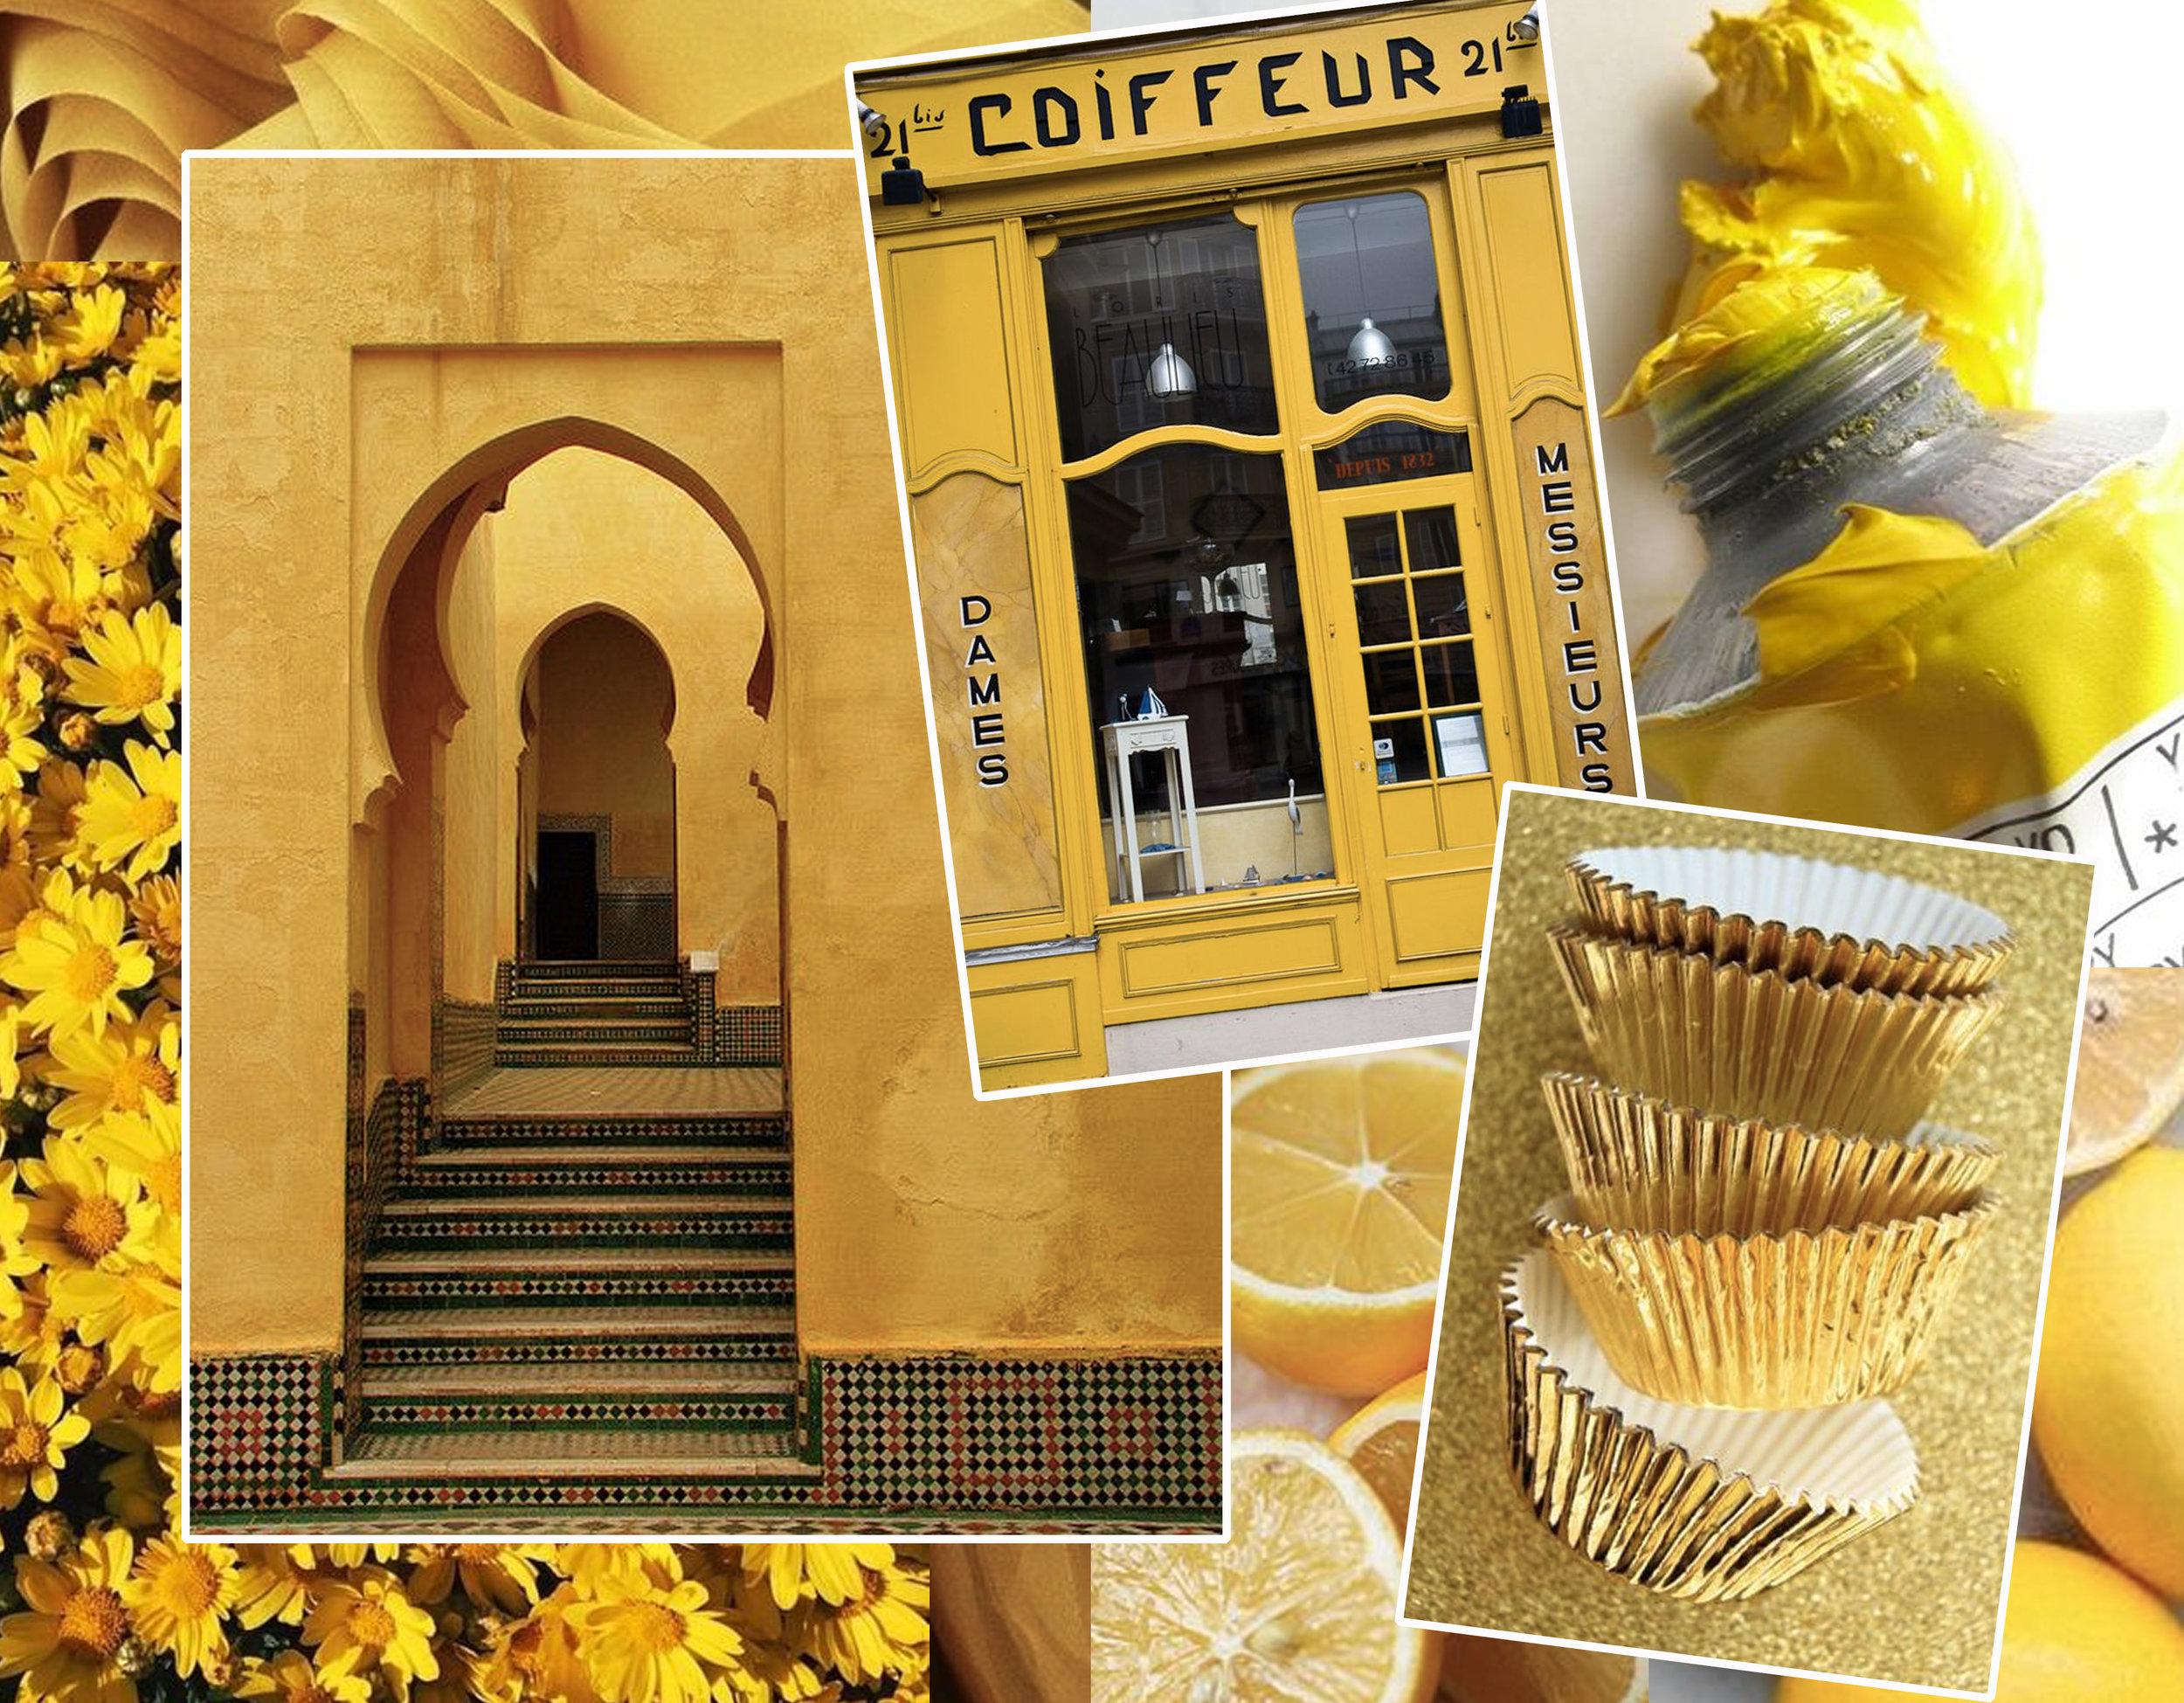 flowers via  Alurium  - architectural image via  Flickr  - coiffeur via  Flickr  - lemons via  The Small Things  - paint via  Pinterest